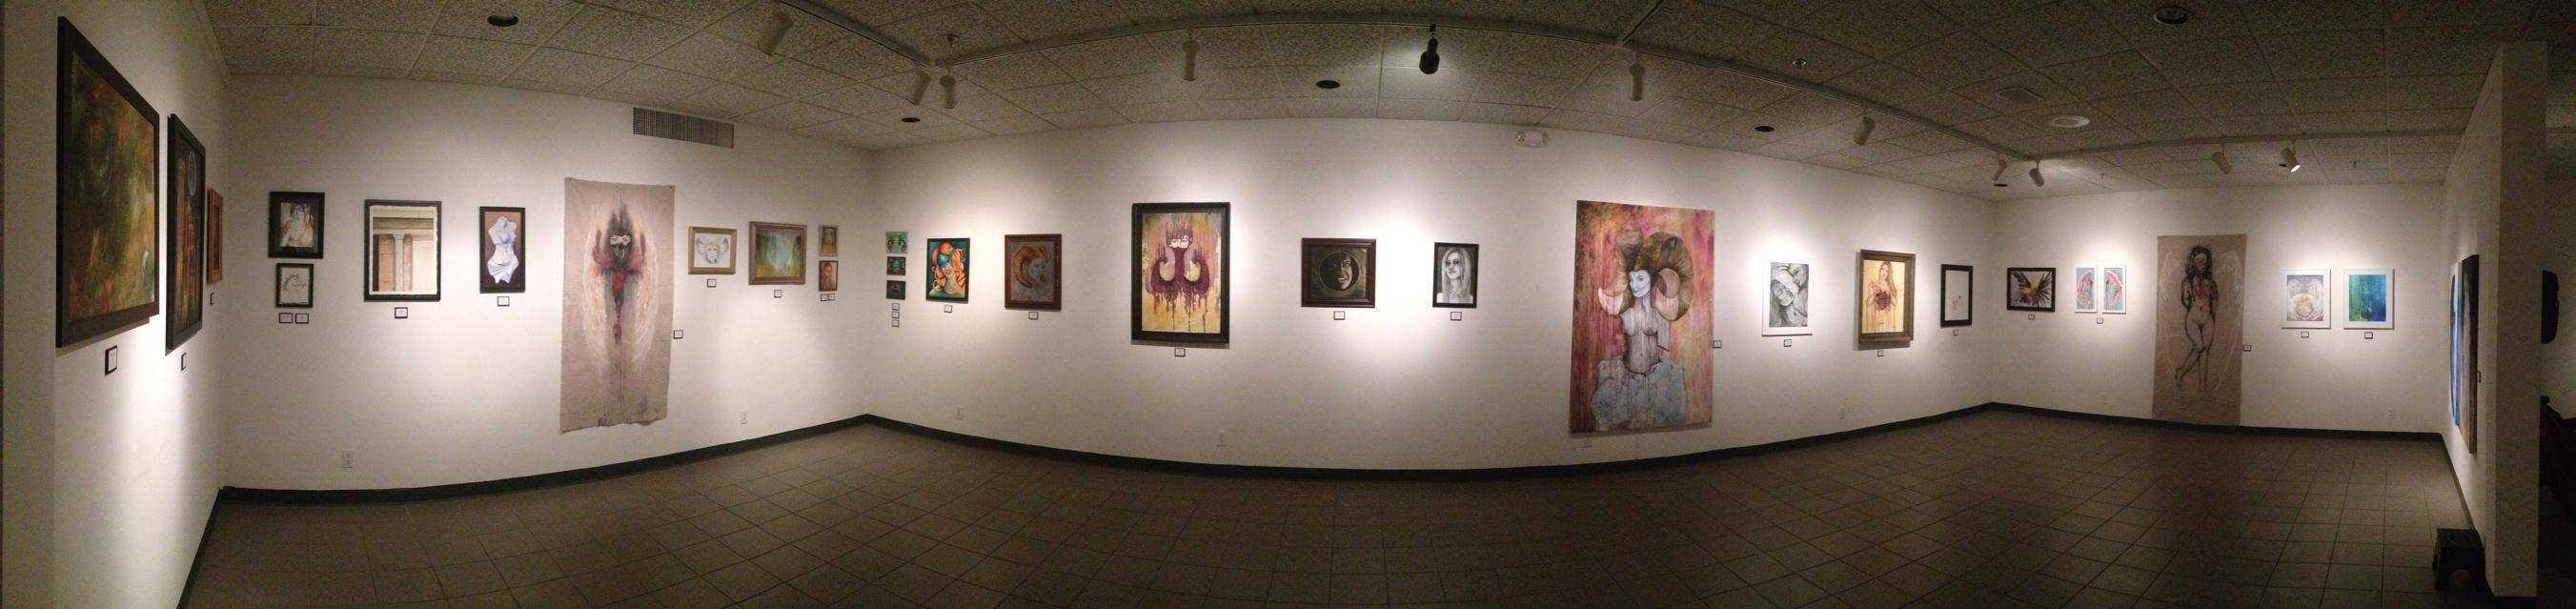 Jennifer McCarty Art Show, Las Vegas, NV 01/01/14